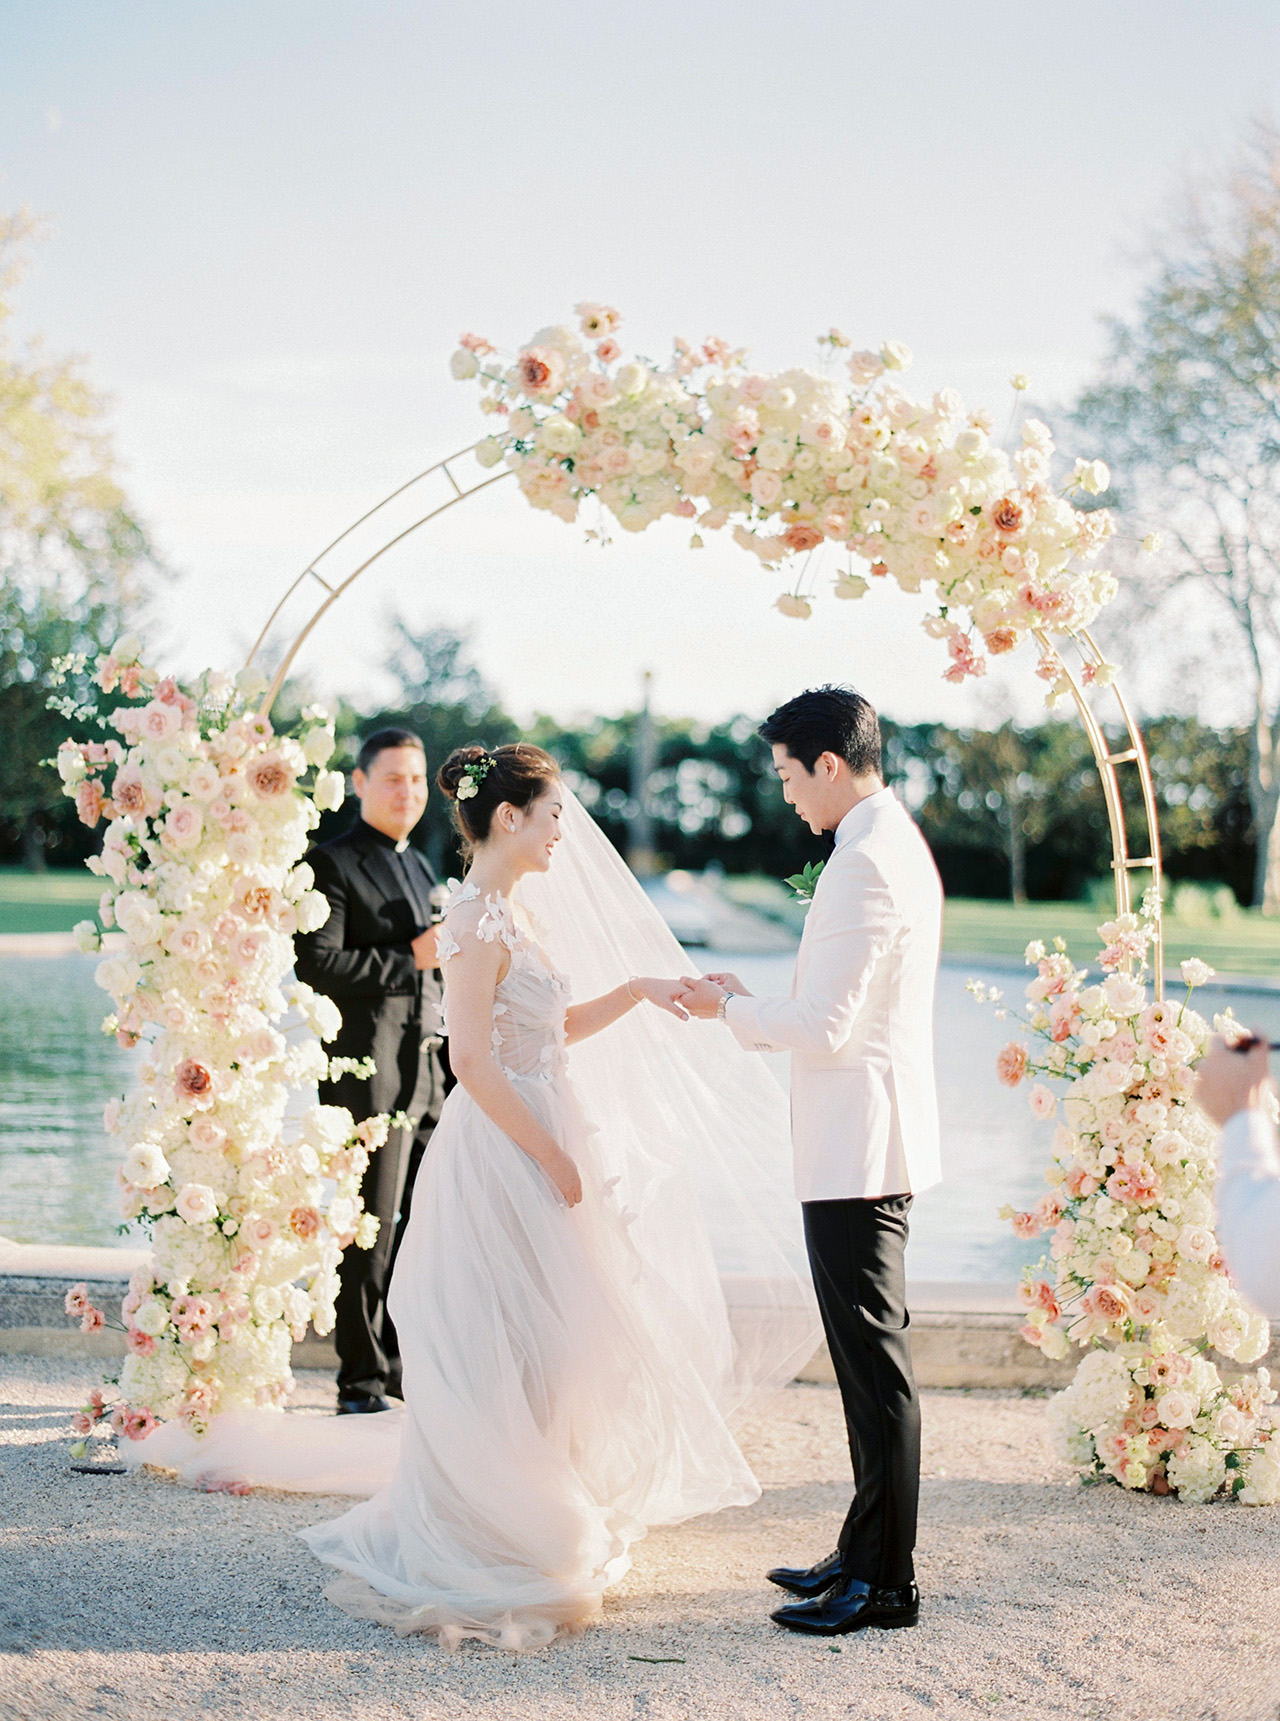 nancy sangho wedding ceremony vows couple